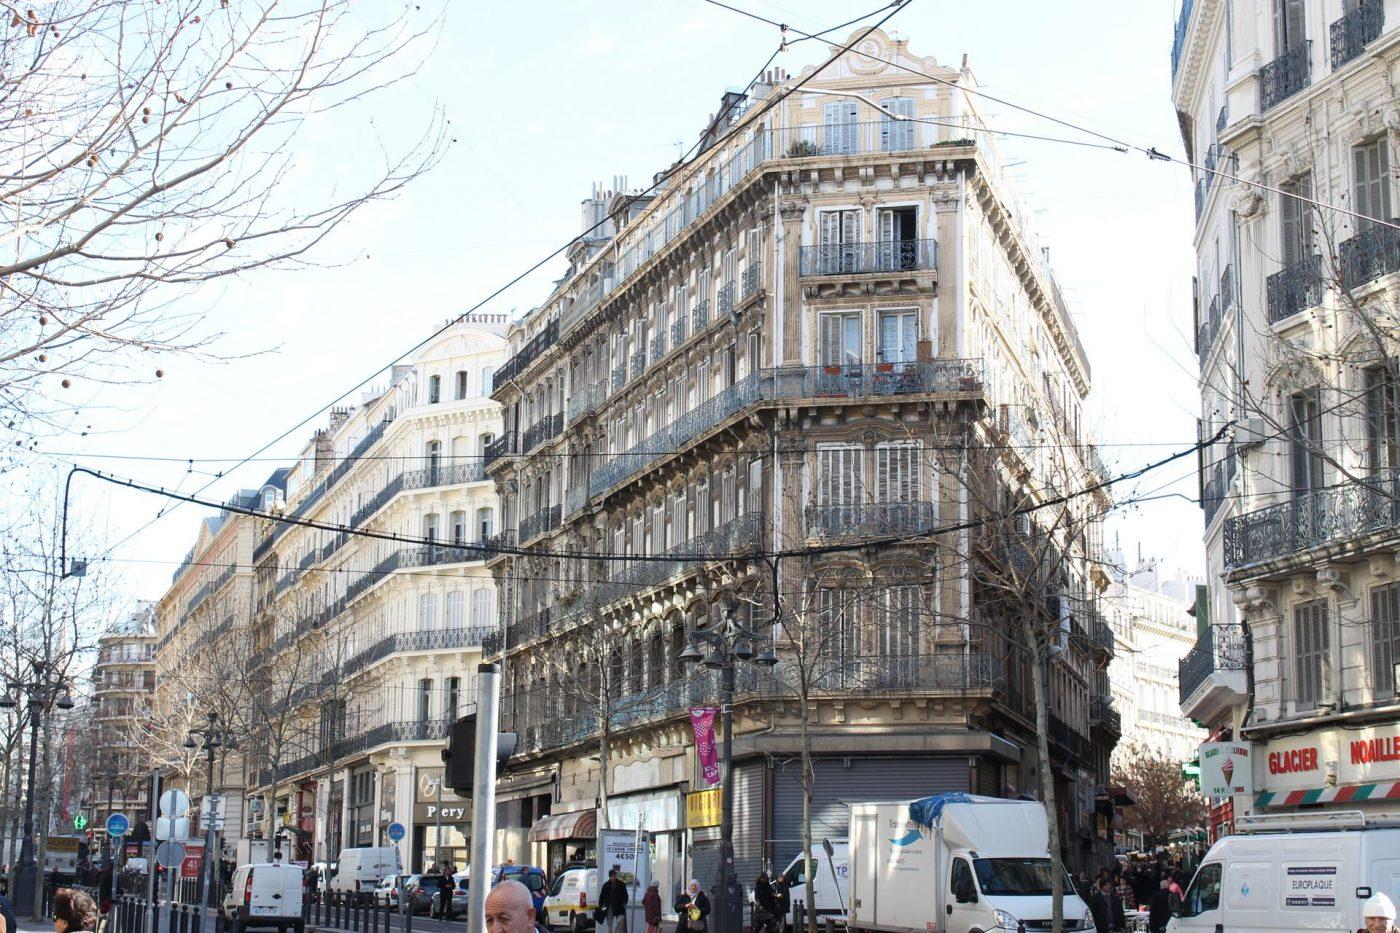 Hotel 4 etoiles noailles marseille for Hotels 4 etoiles marseille